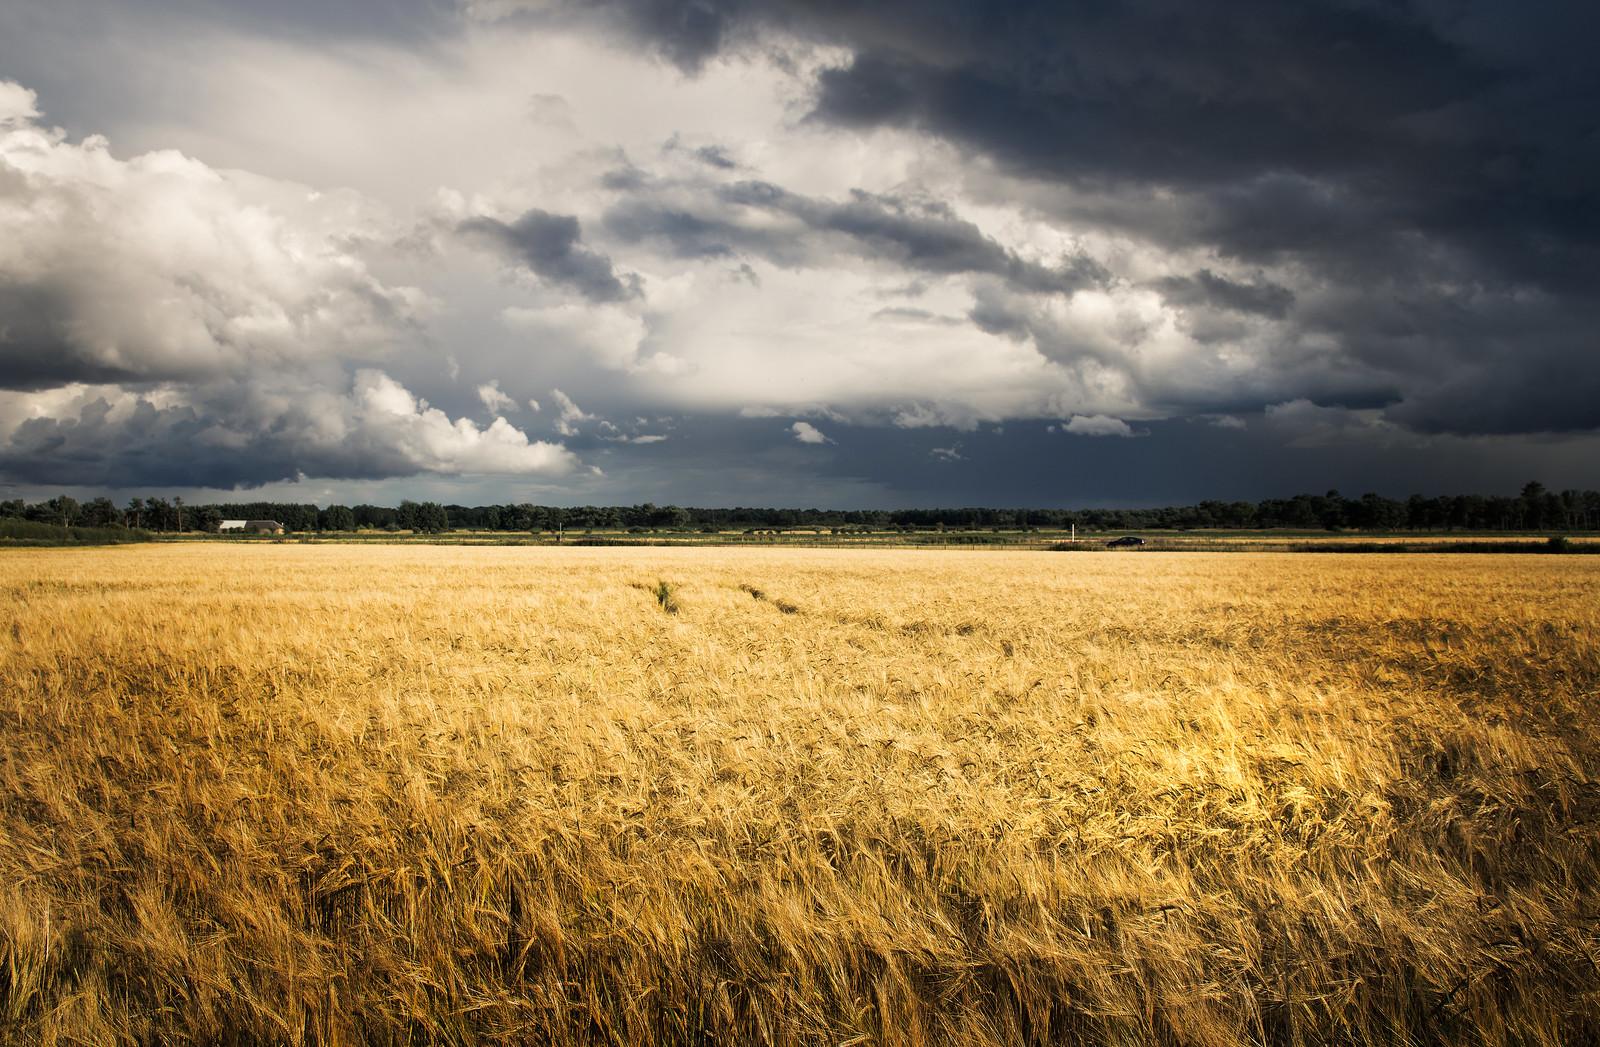 The Wheat Field, RICOH PENTAX K-3, Sigma 17-50mm F2.8 EX DC HSM